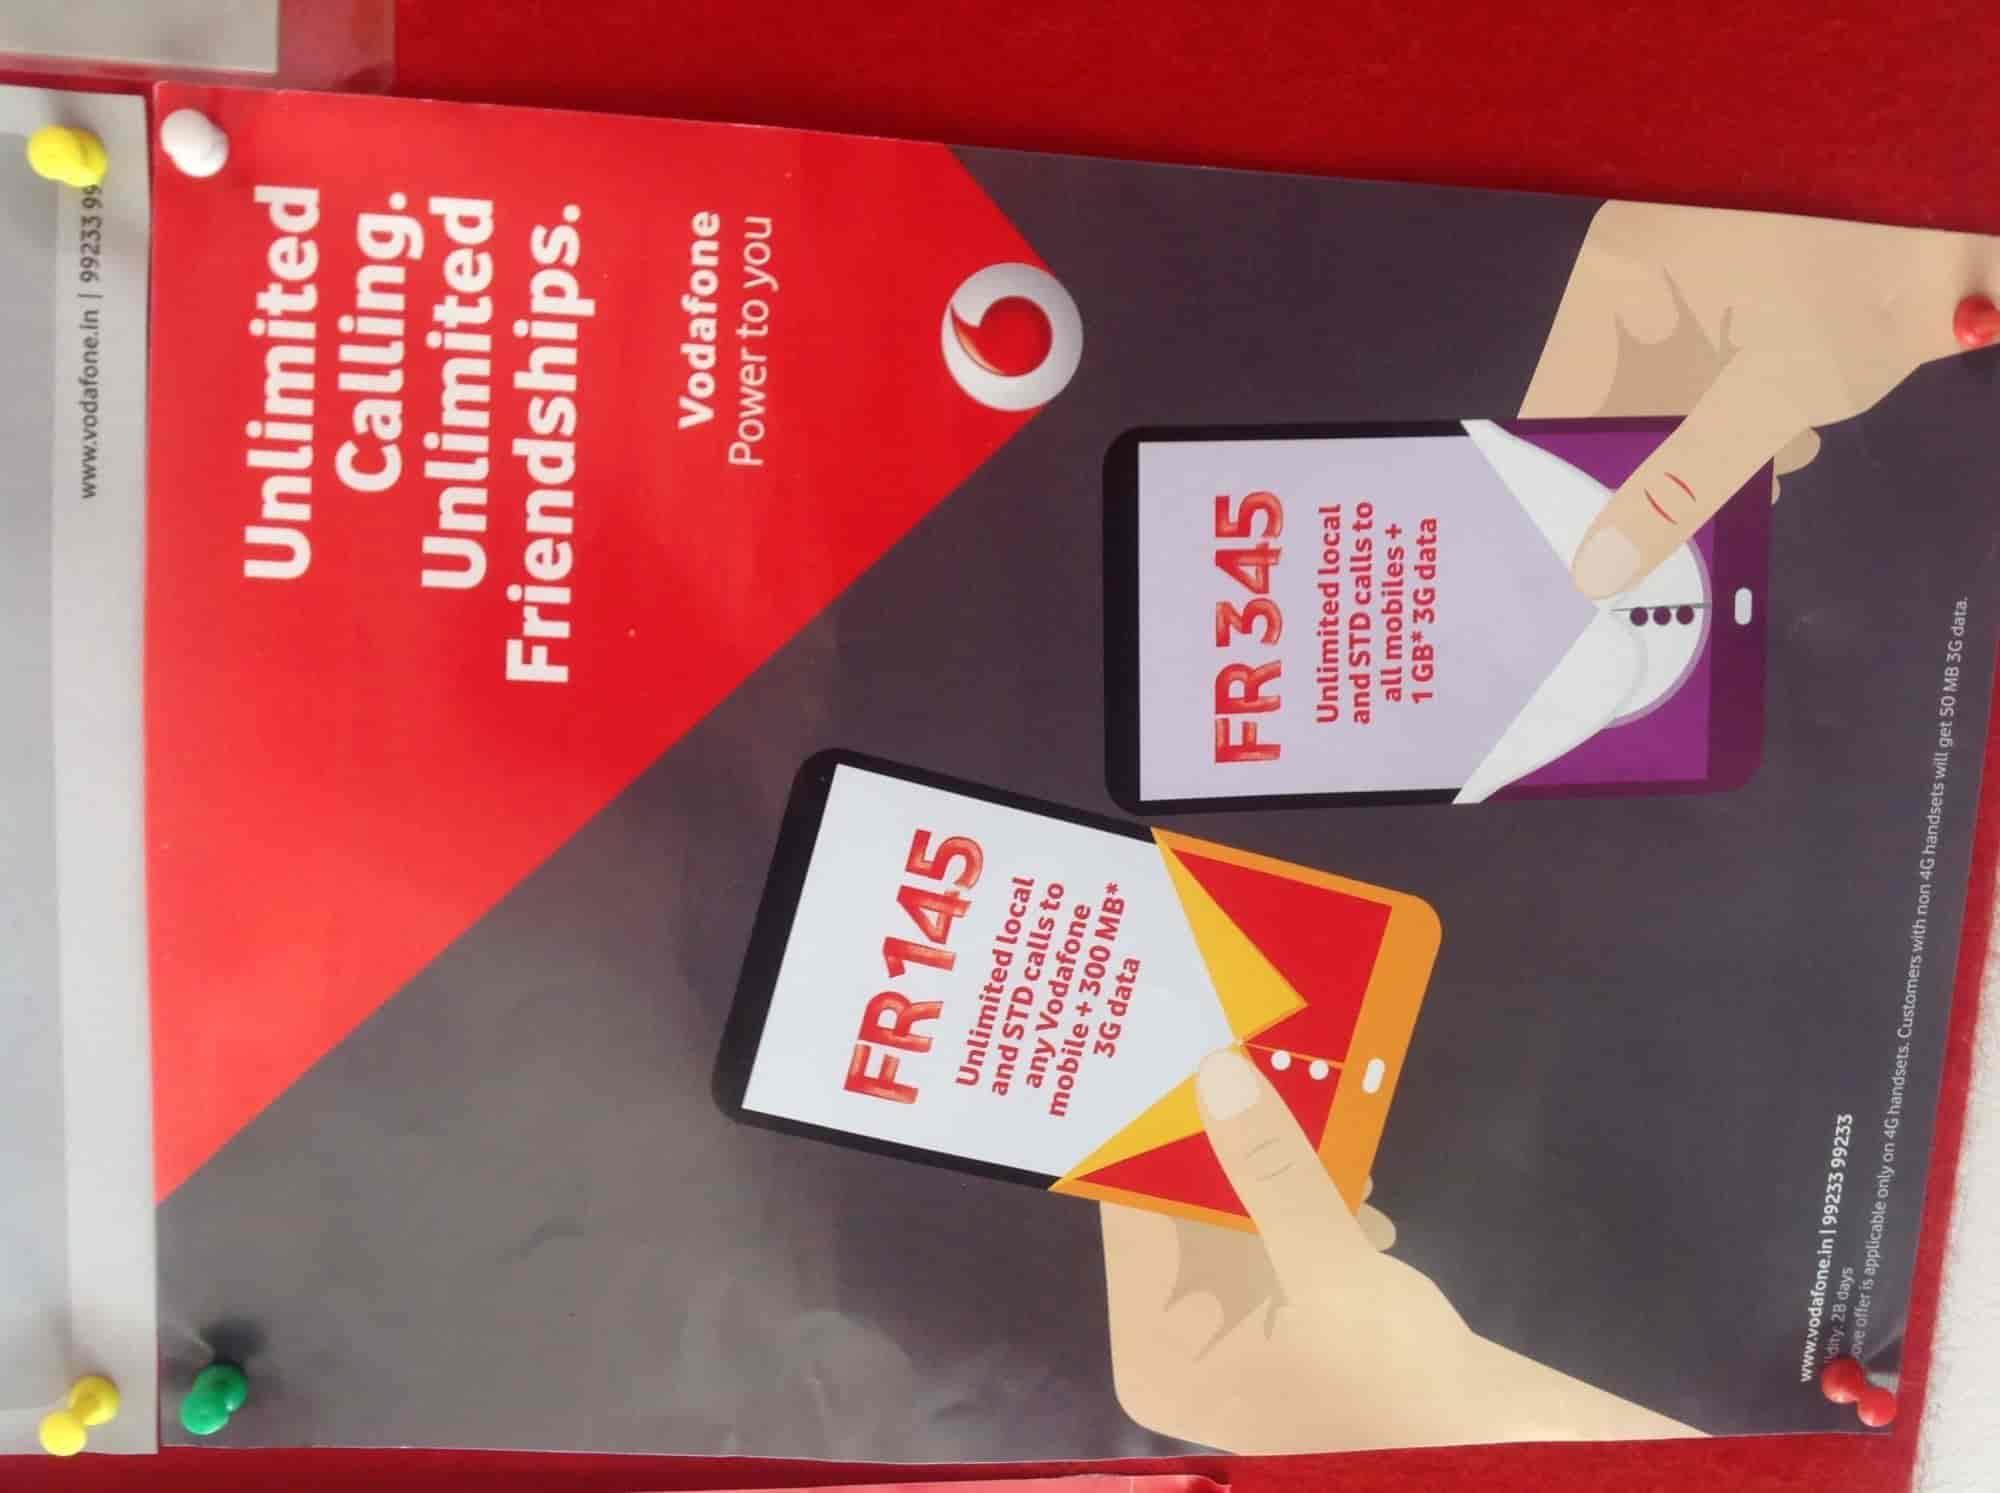 Vodafone Mini Store, Rajarampuri - Mobile Phone Simcard